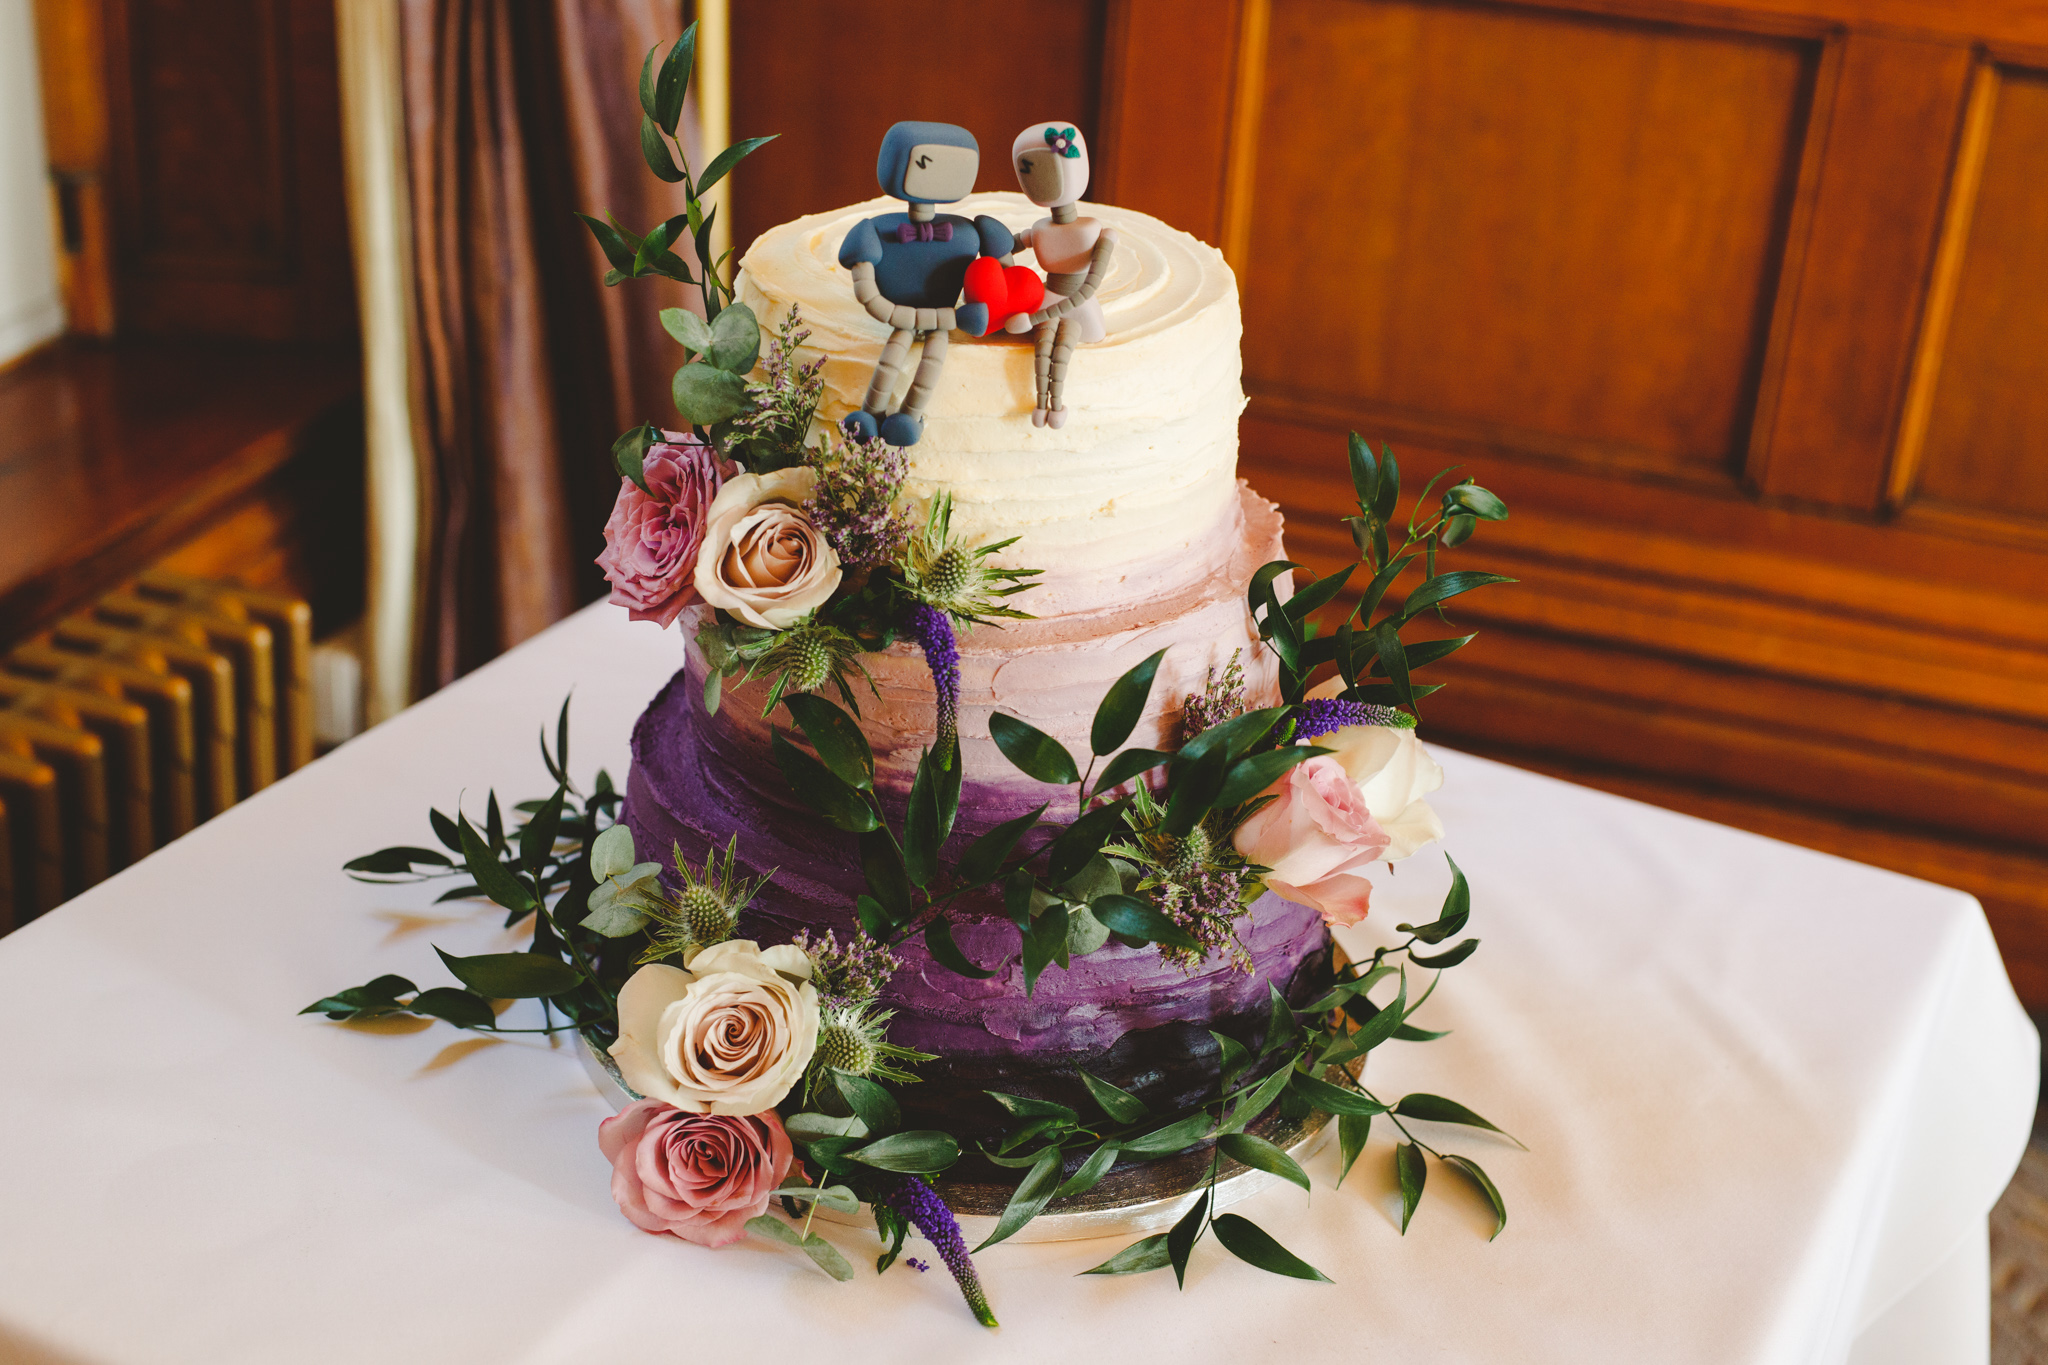 derbyshire-wedding-photographer-videographer-camera-hannah-12.jpg